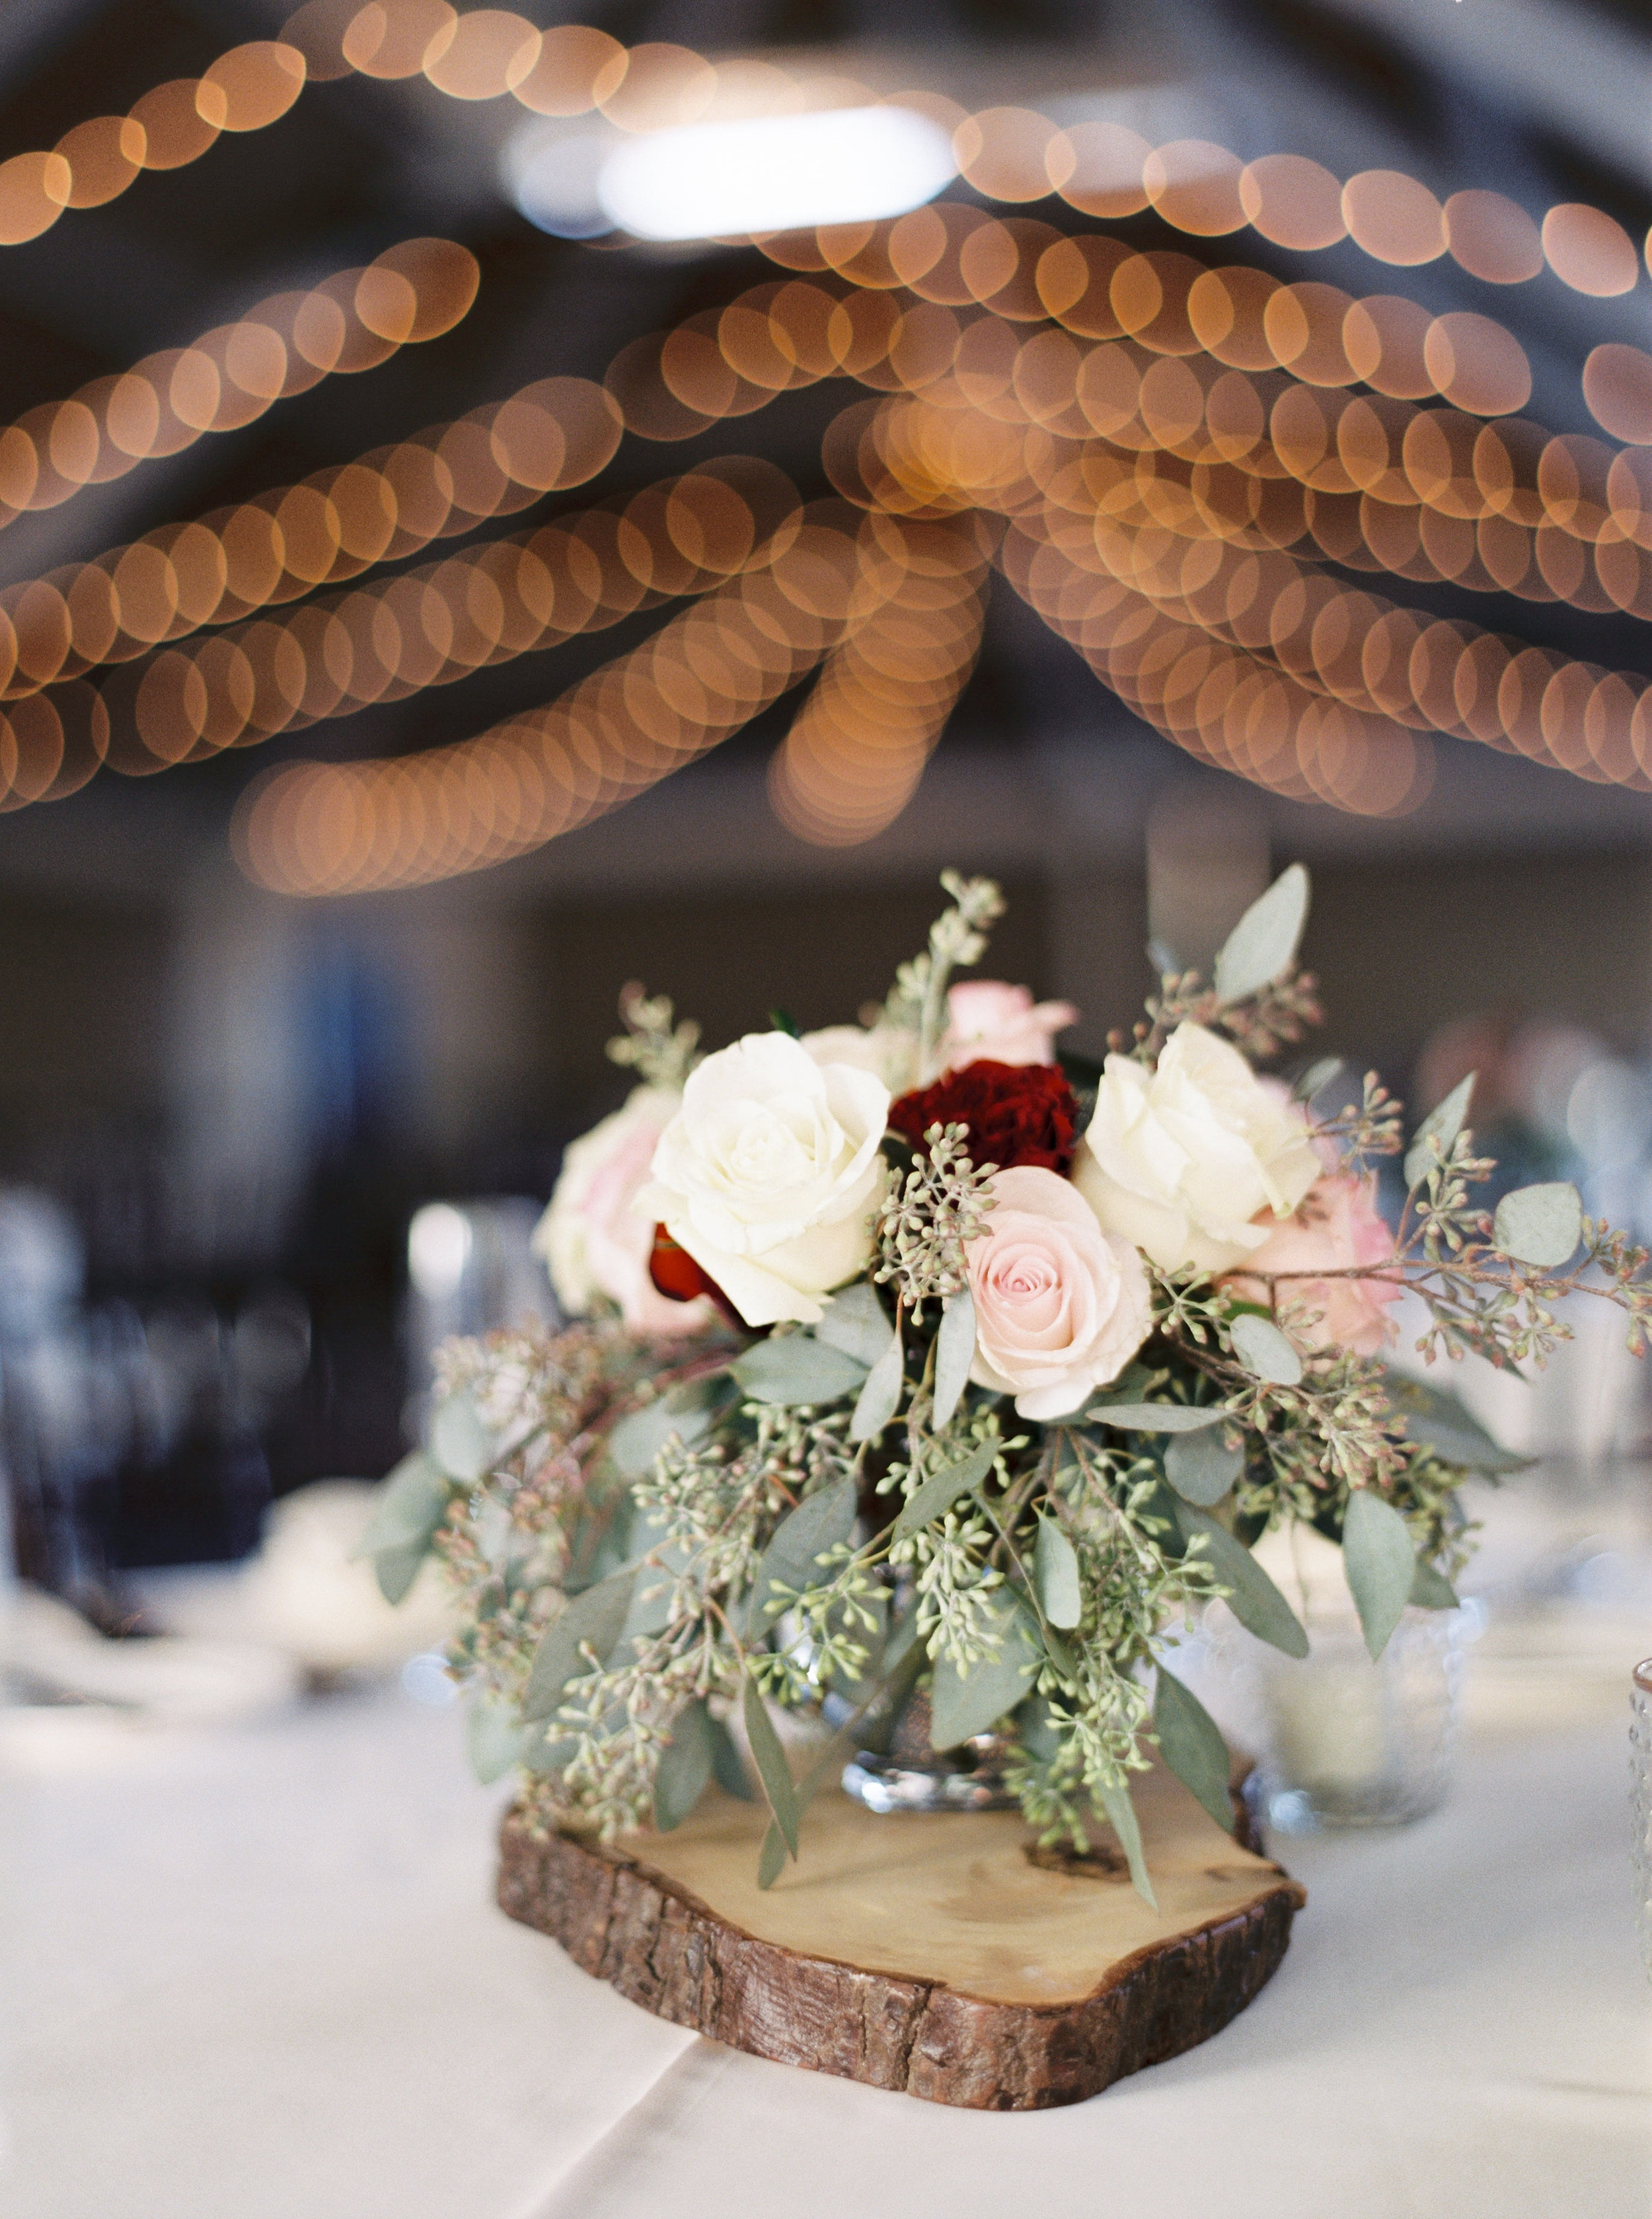 Tenaya-lodge-wedding-at-yosemite-national-park-california-71.jpg